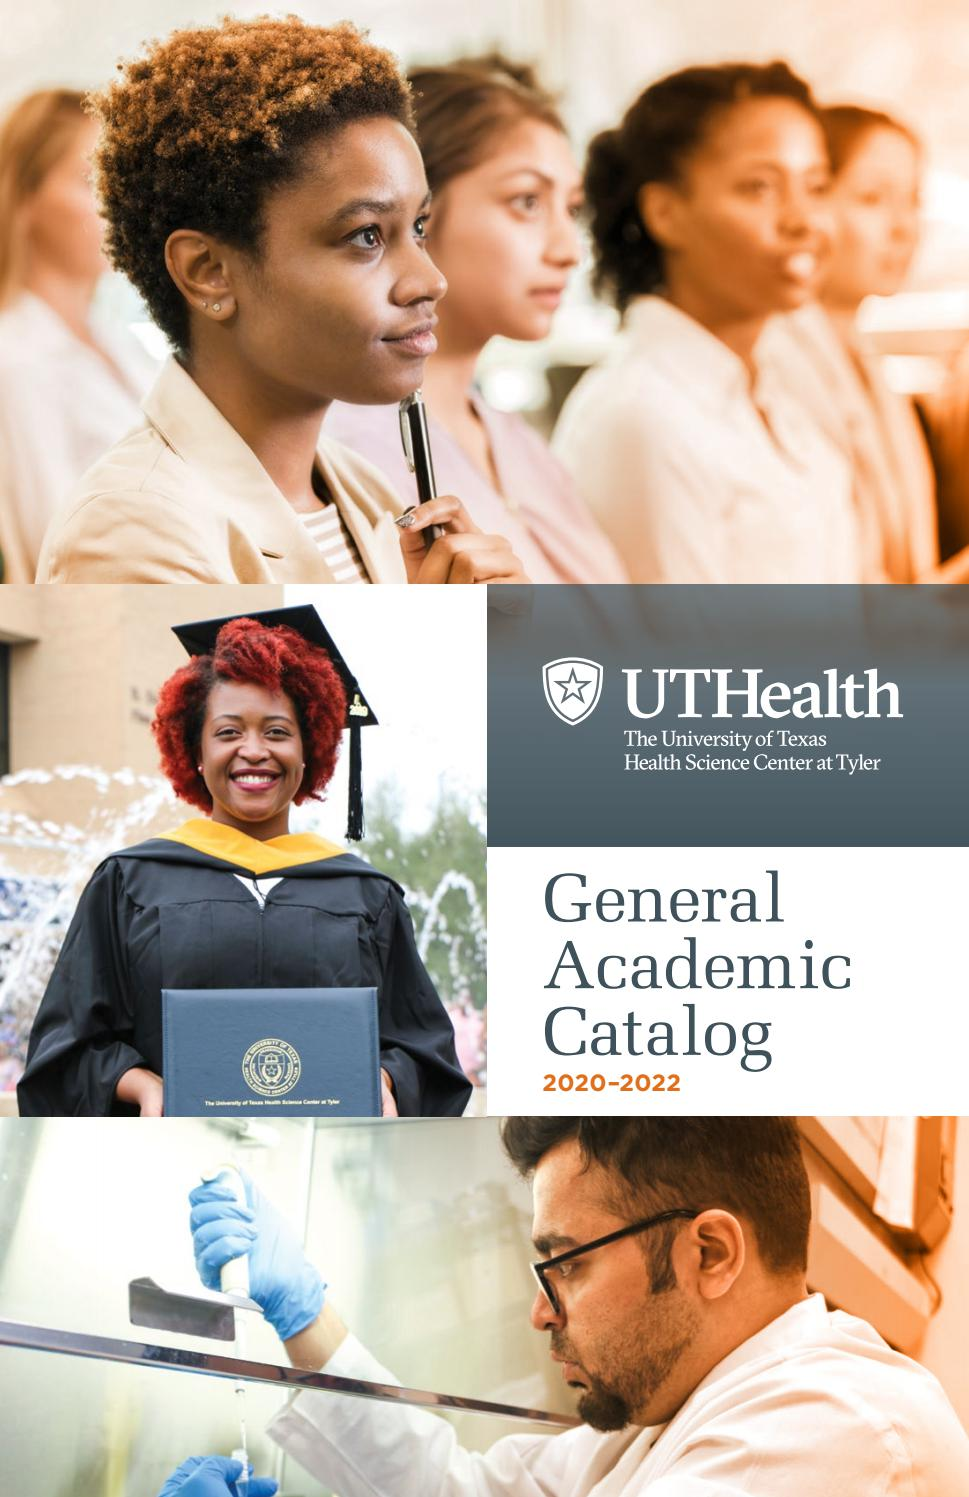 University Of Utah Academic Calendar Fall 2022.General Academic Catalog 2020 2022 The University Of Texas Health Science Center At Tyler By Ut Health Science Center At Tyler Issuu